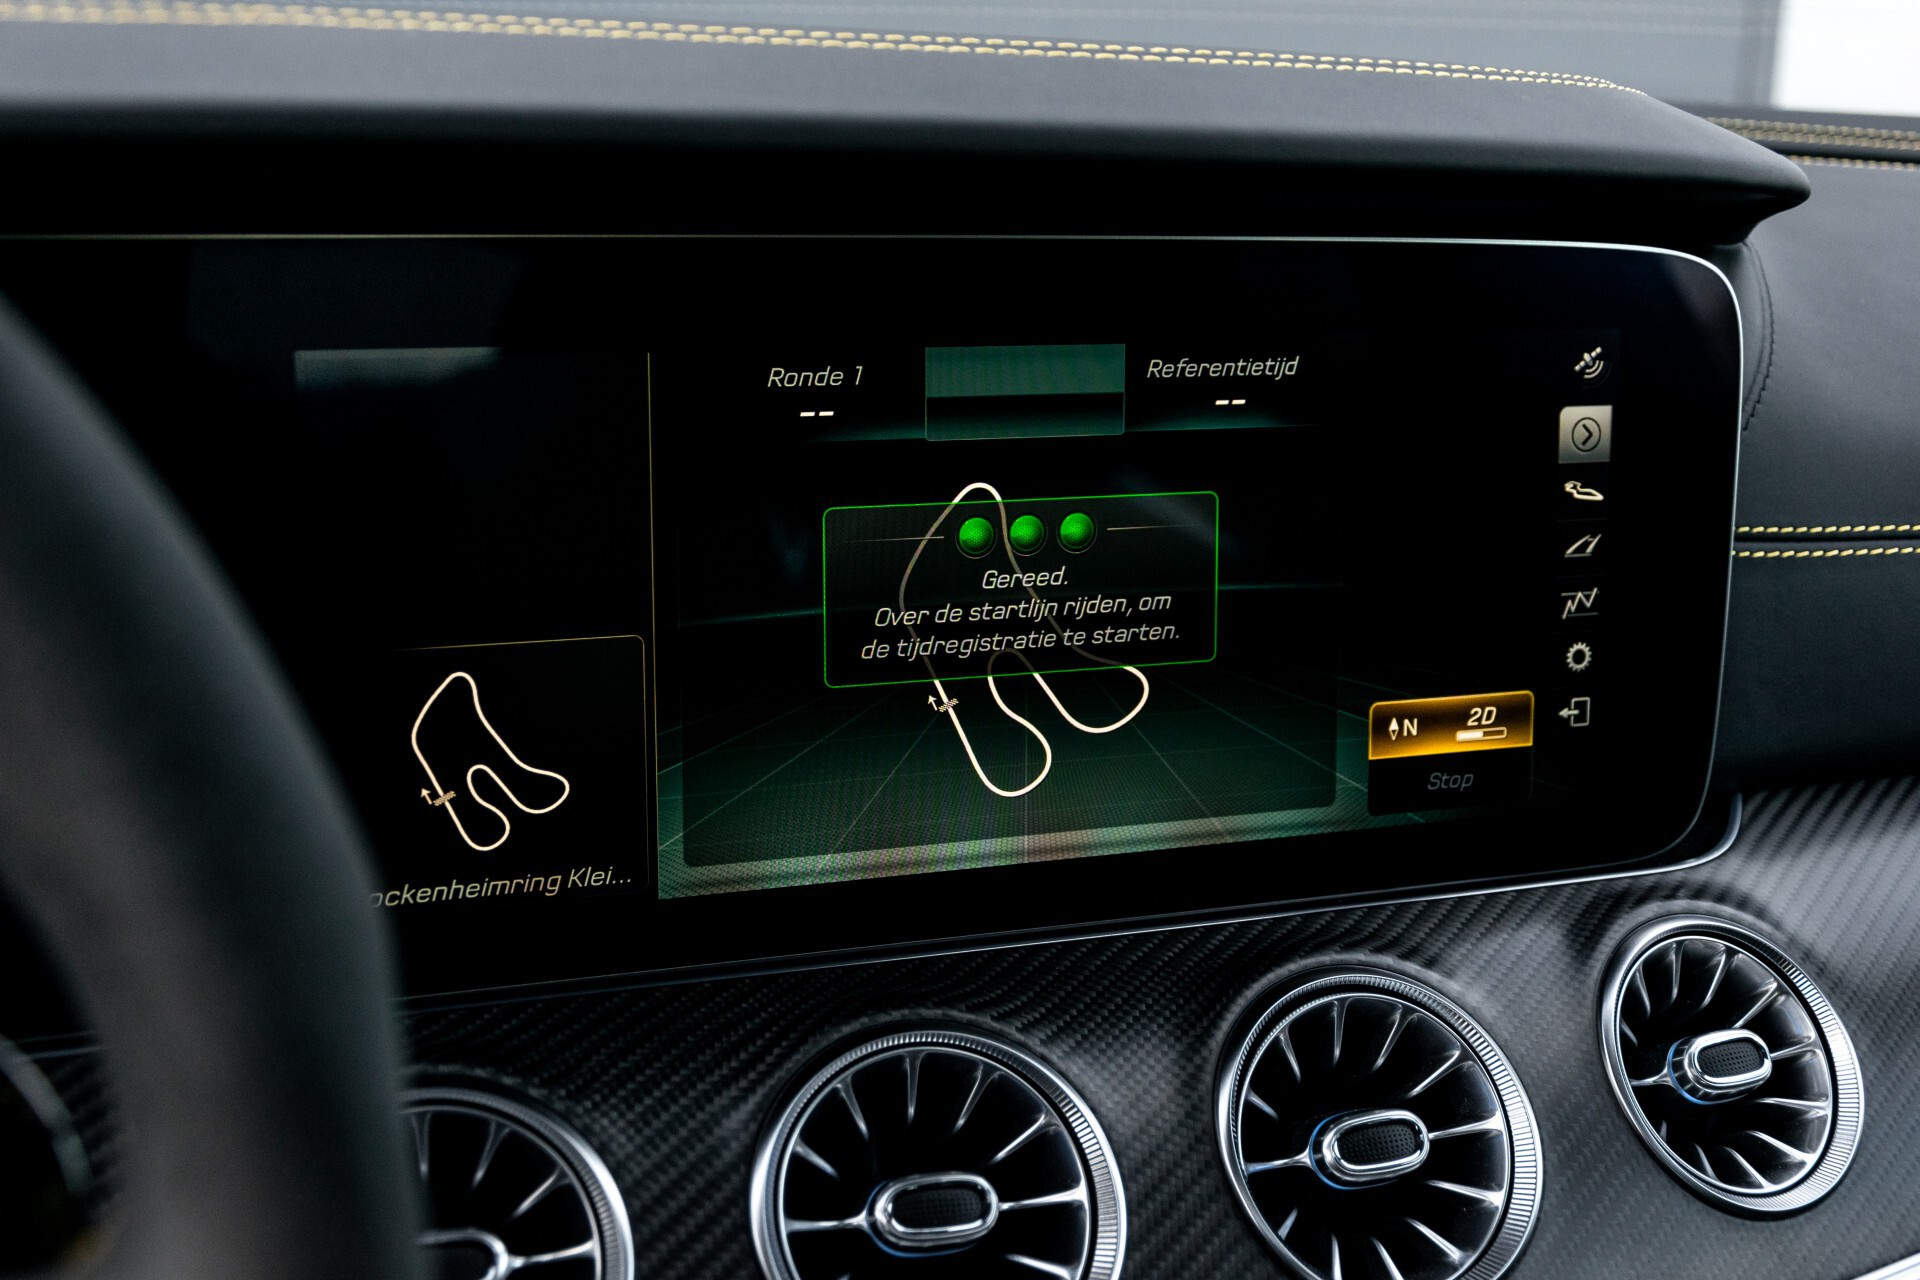 Mercedes-Benz AMG GT 4-Door Coupe 63 S 4MATIC+ Edition 1 Keramisch/Carbon/First Class/Dynamic Plus/Burmester High End 3D Aut9 Foto 43